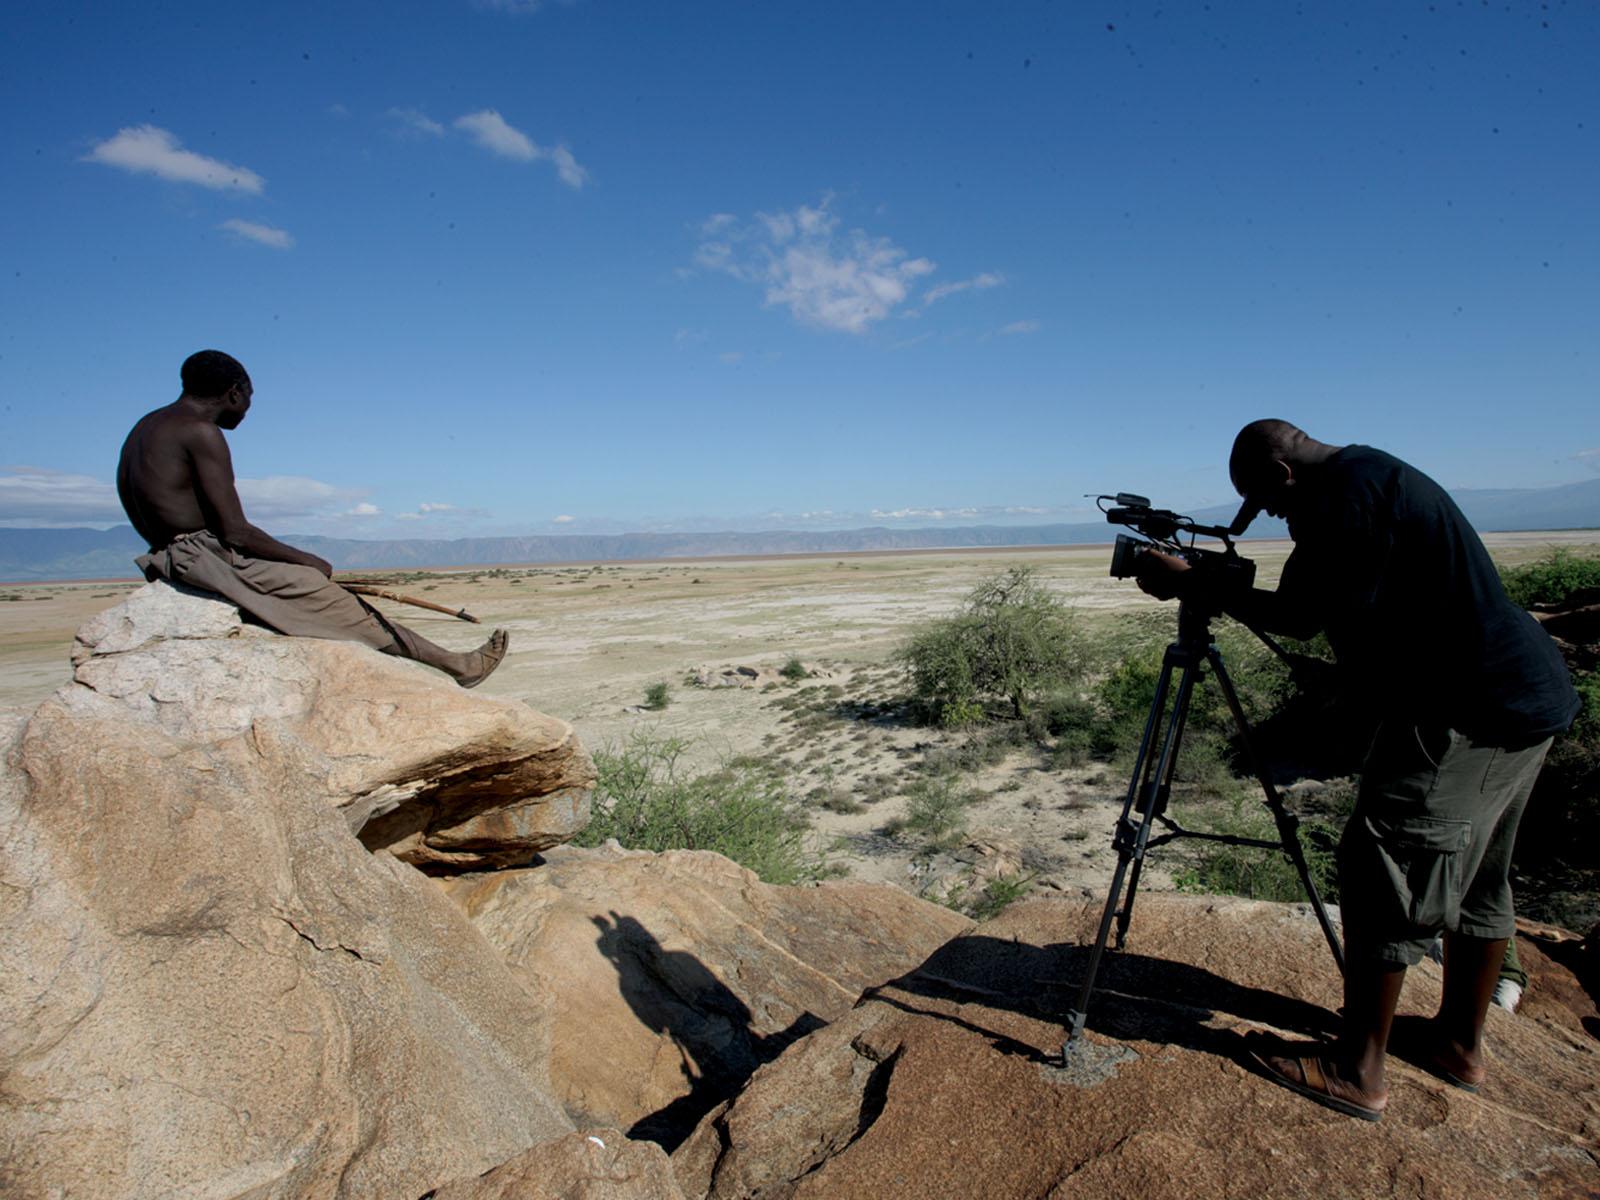 Gallery Tours & Safari - Film